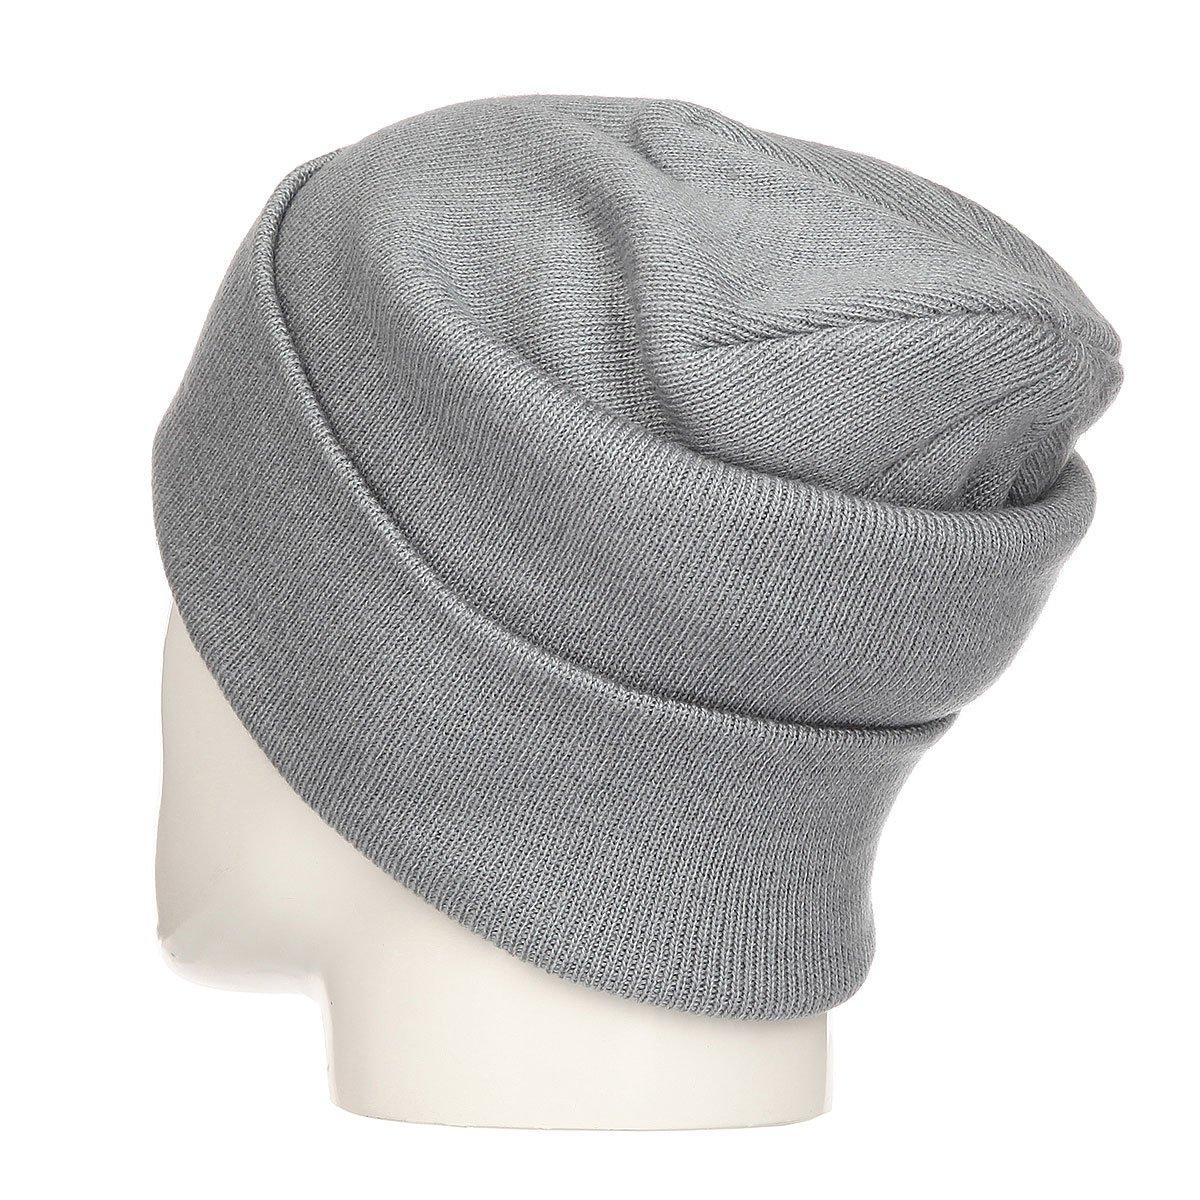 4e8d0efeee3 Купить шапку носок Rip Curl Rolled Up Beton Marle в интернет ...